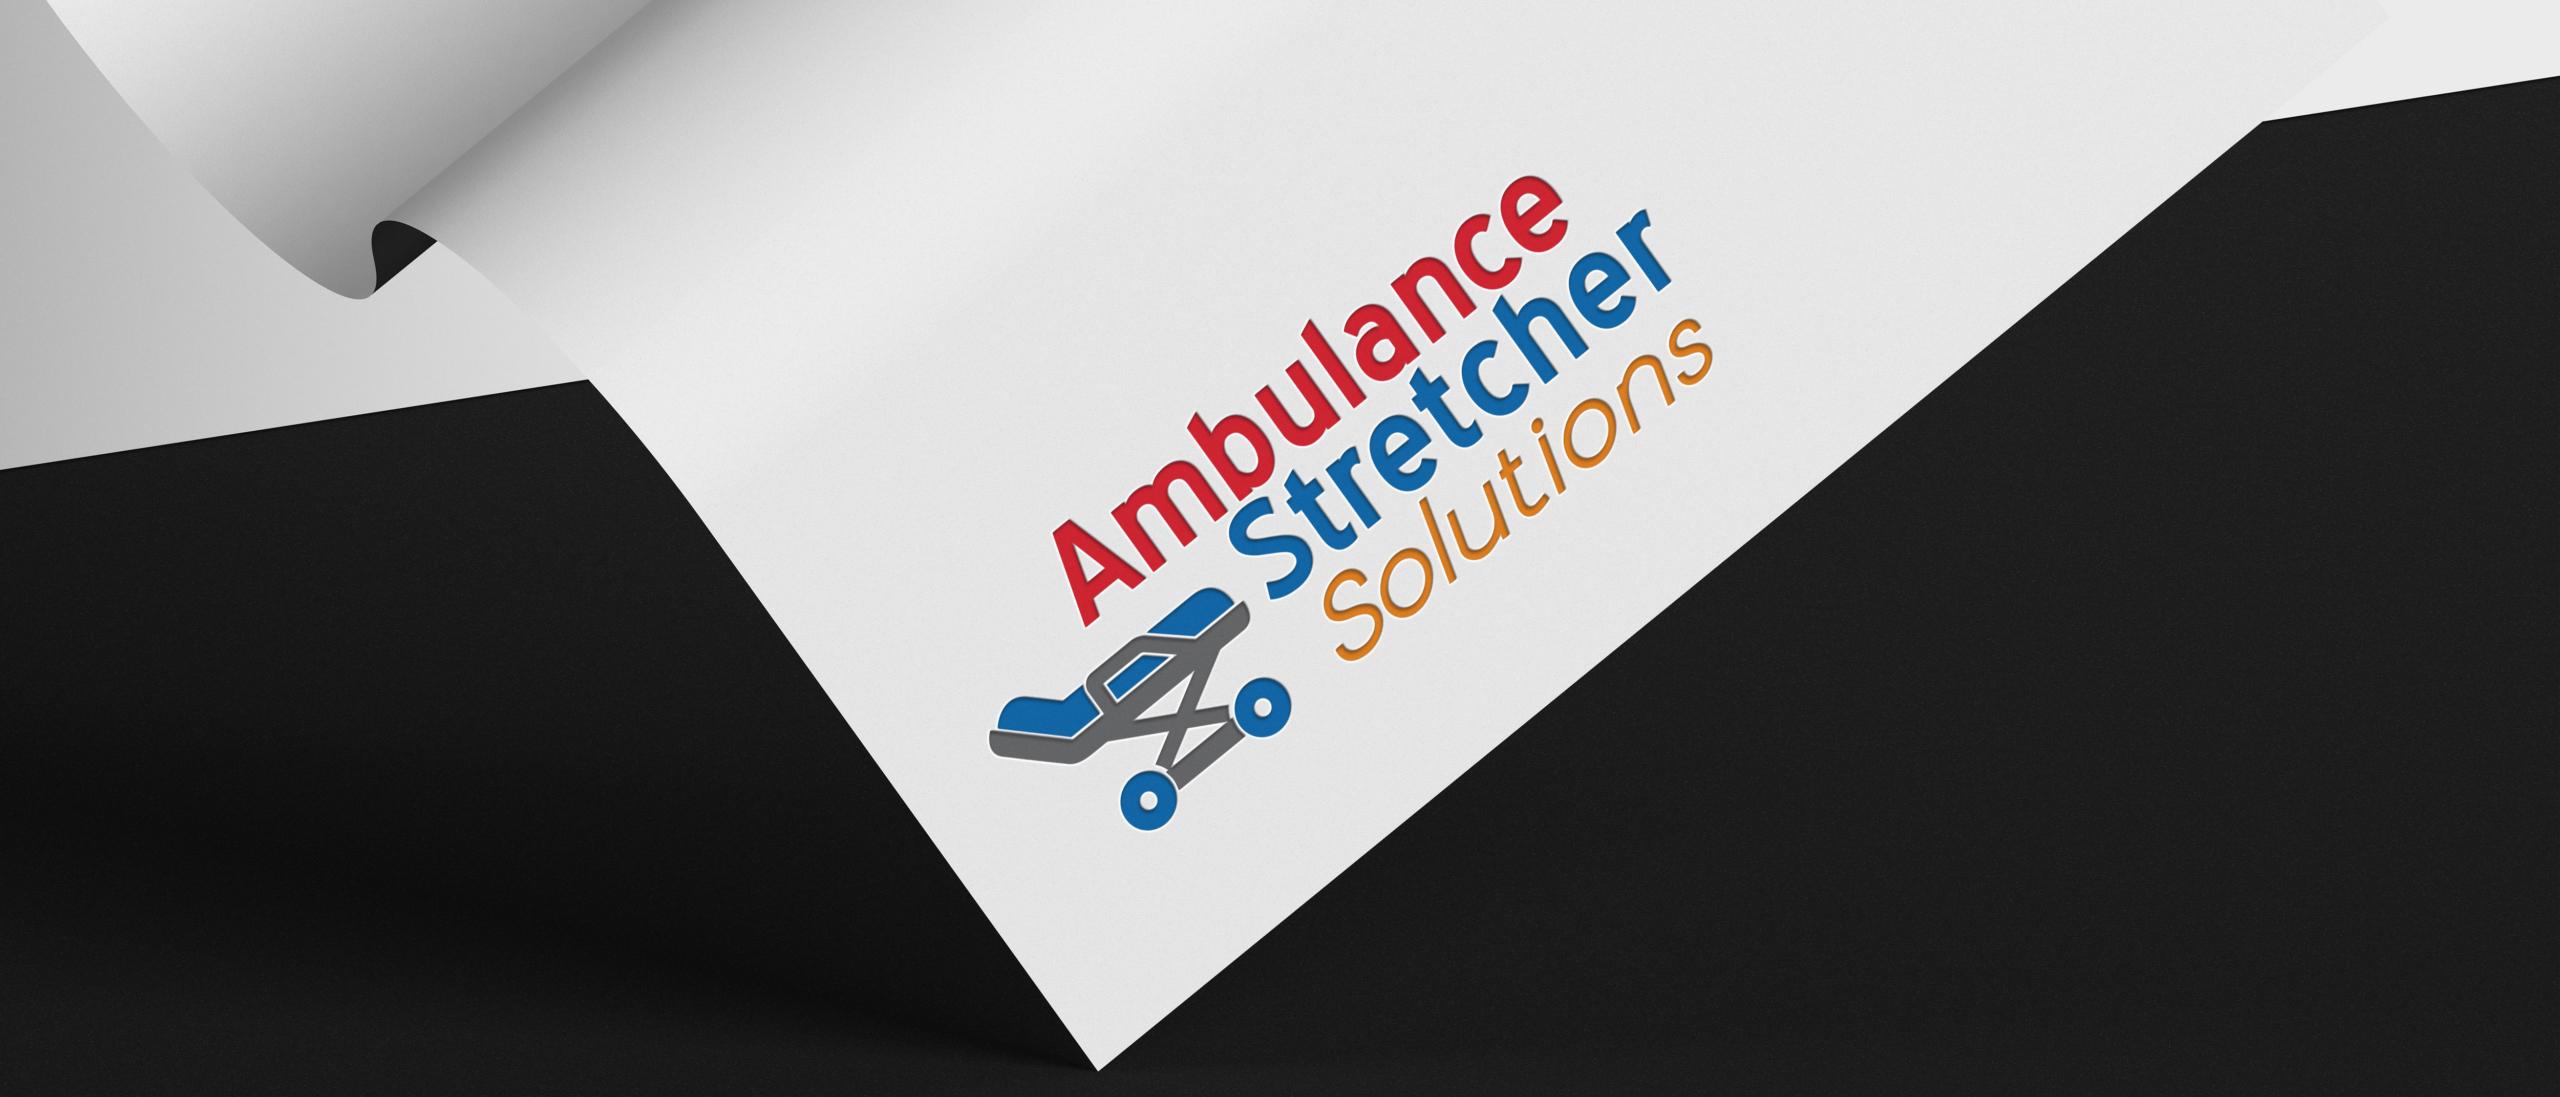 Ambulance Stretcher Solutions